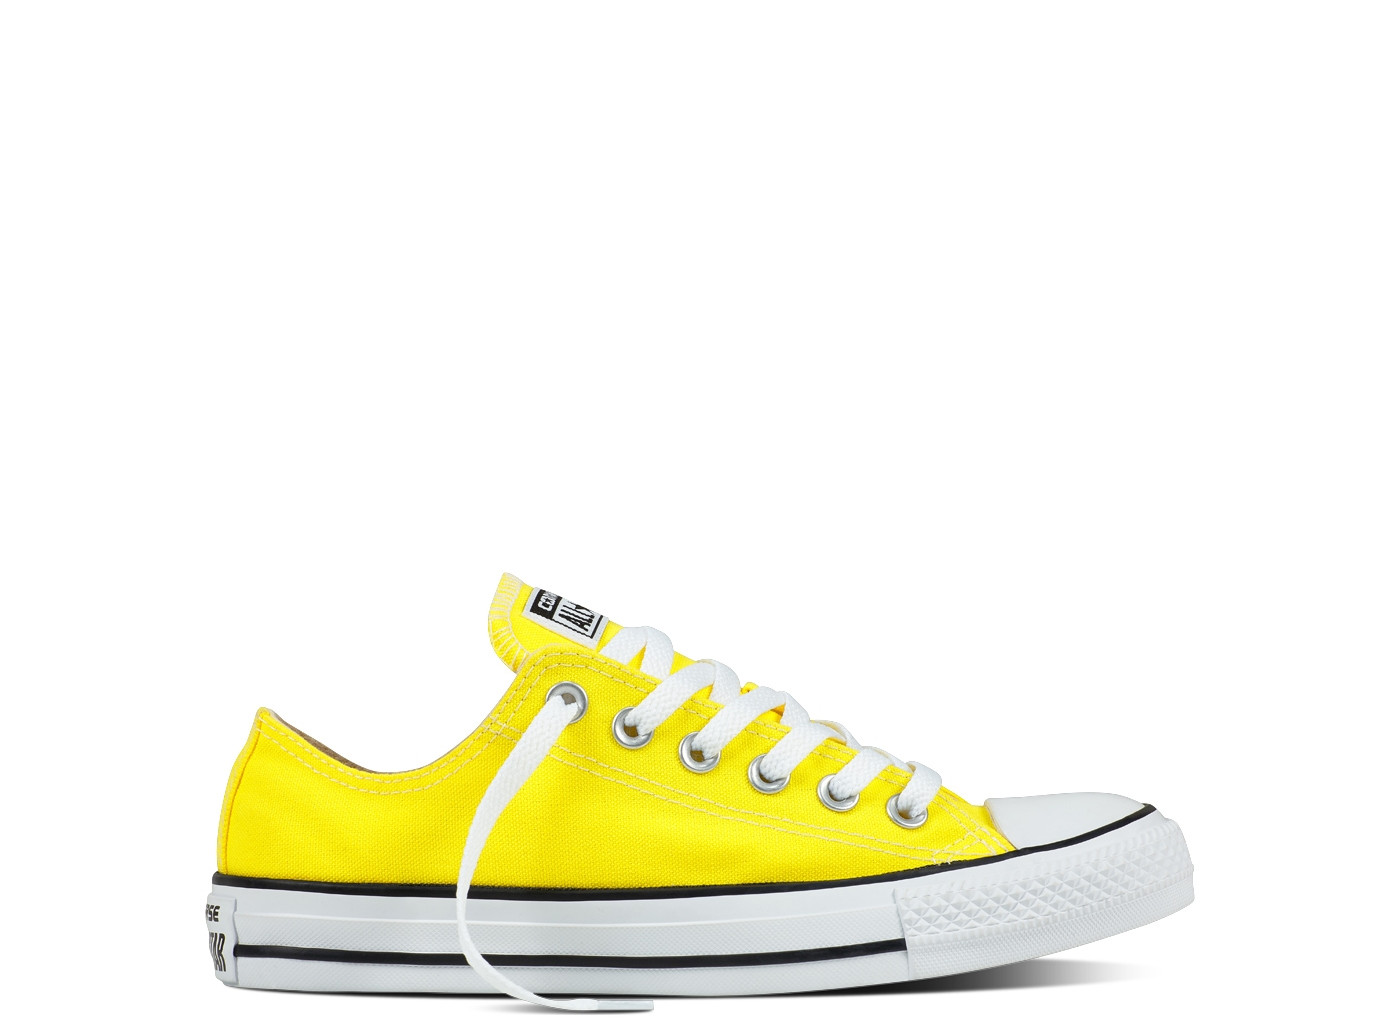 converse basse jaune